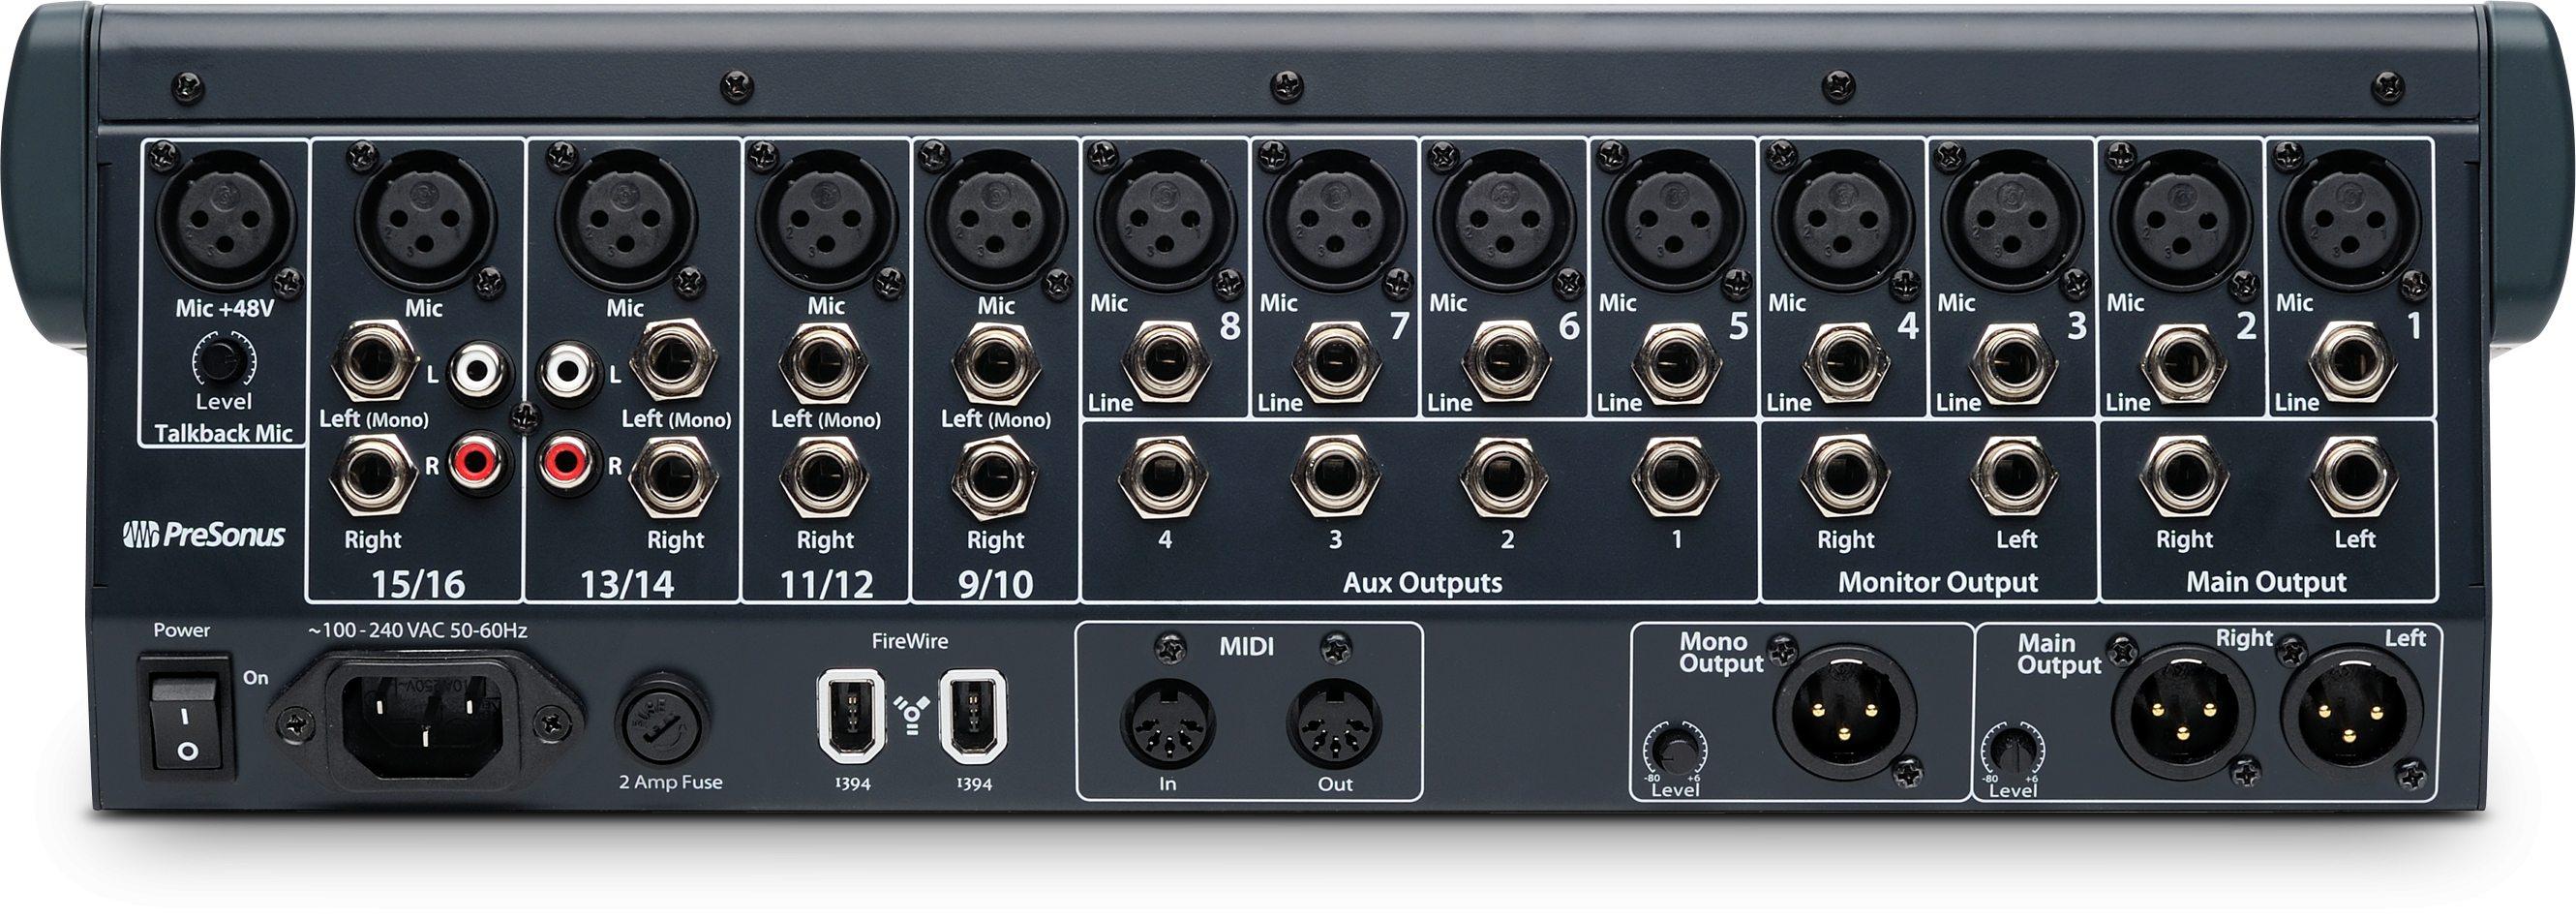 studiolive 16 0 2 media presonus rh presonus com StudioLive Mixdown On StudioLive with External Pre Amp